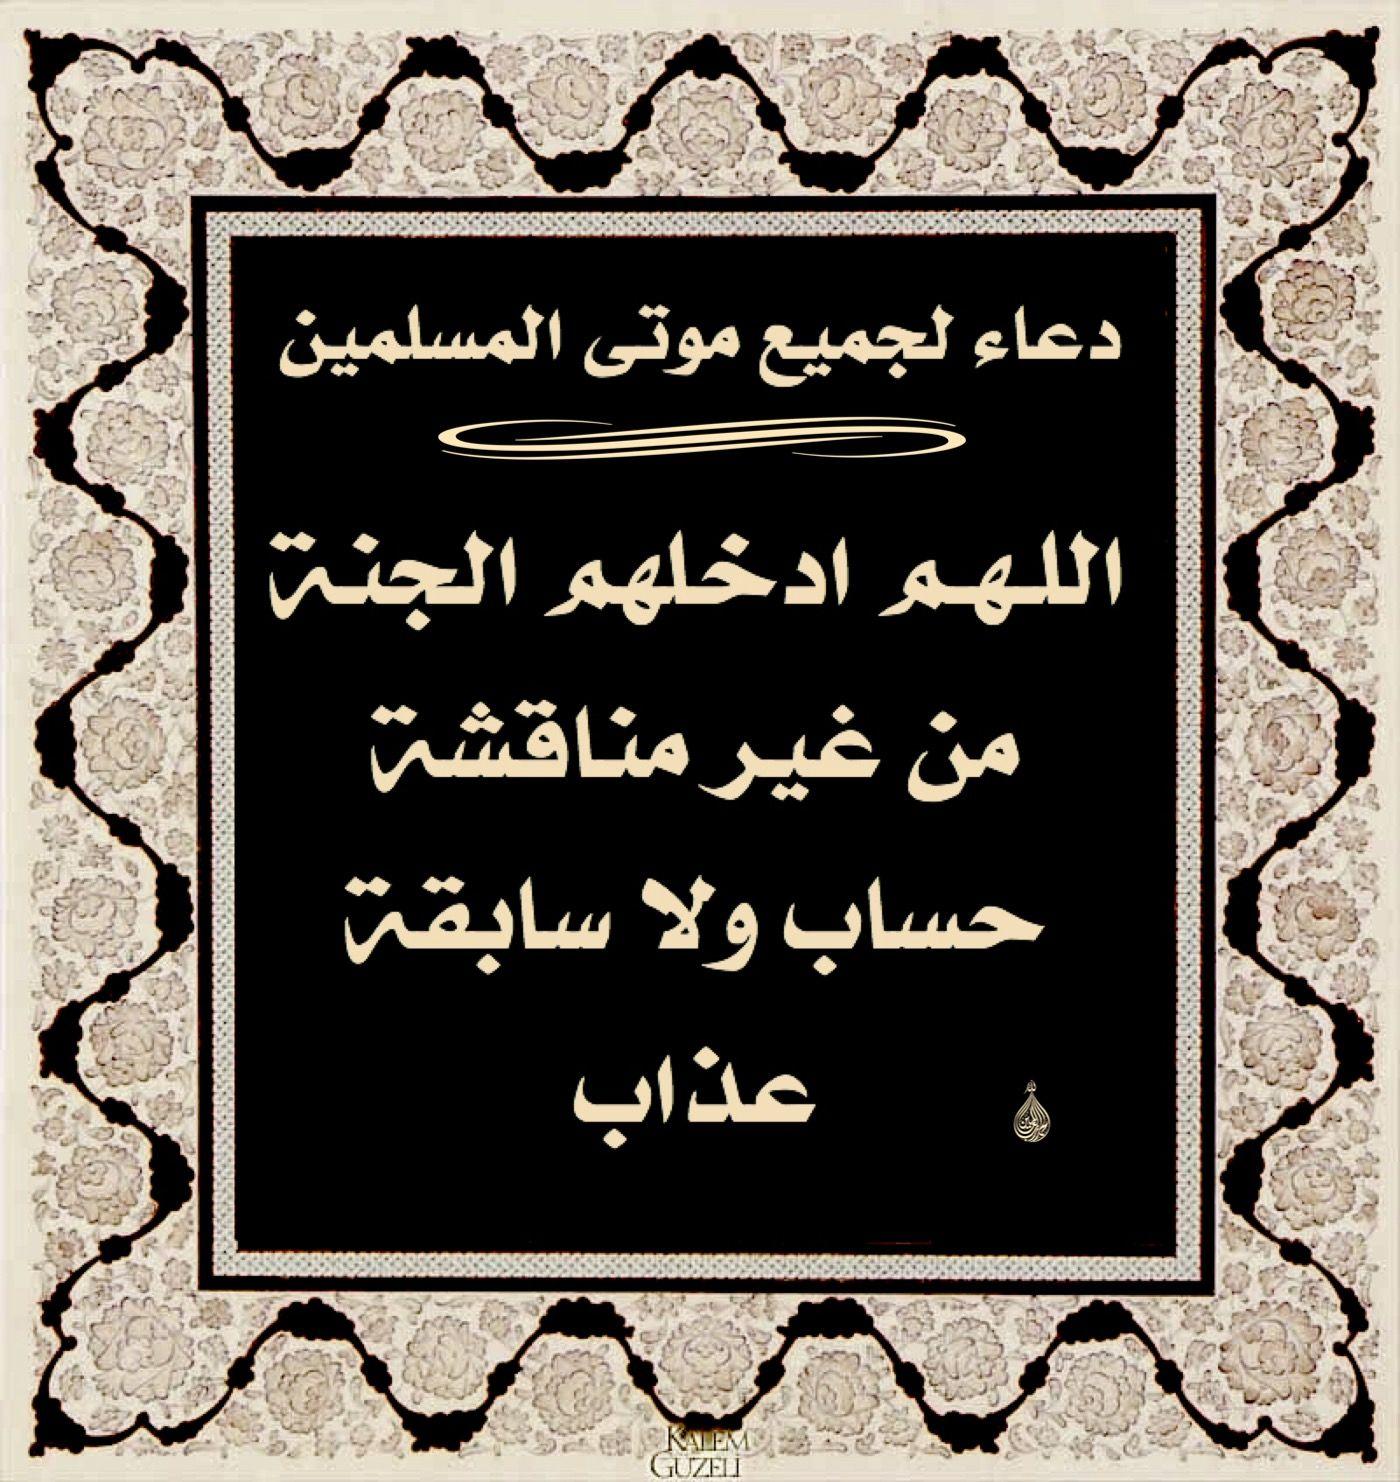 Pin By Zahrat Afaf On اللهم ارحم أموات المسلمين Chalkboard Quote Art Art Quotes Chalkboard Quotes